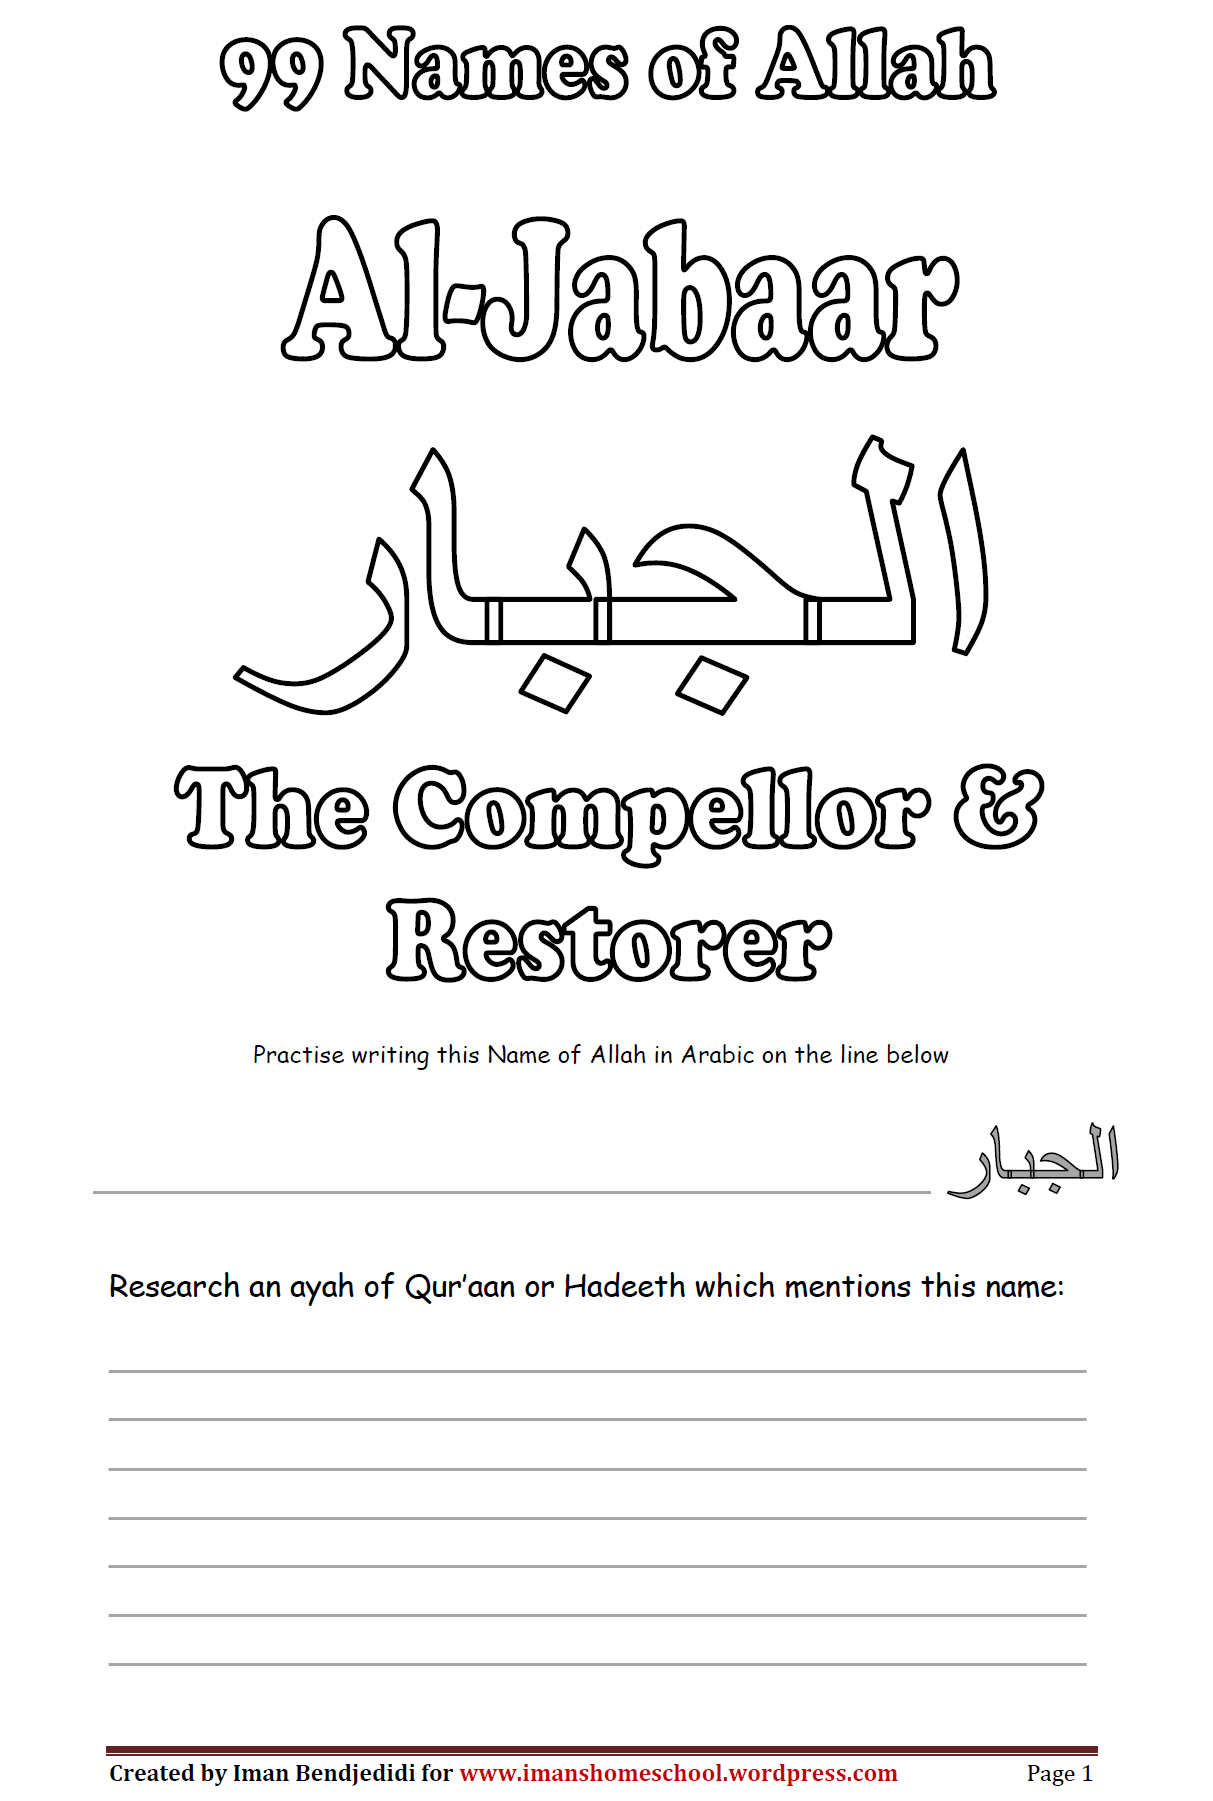 Free 99 Names Of Allah Worksheets